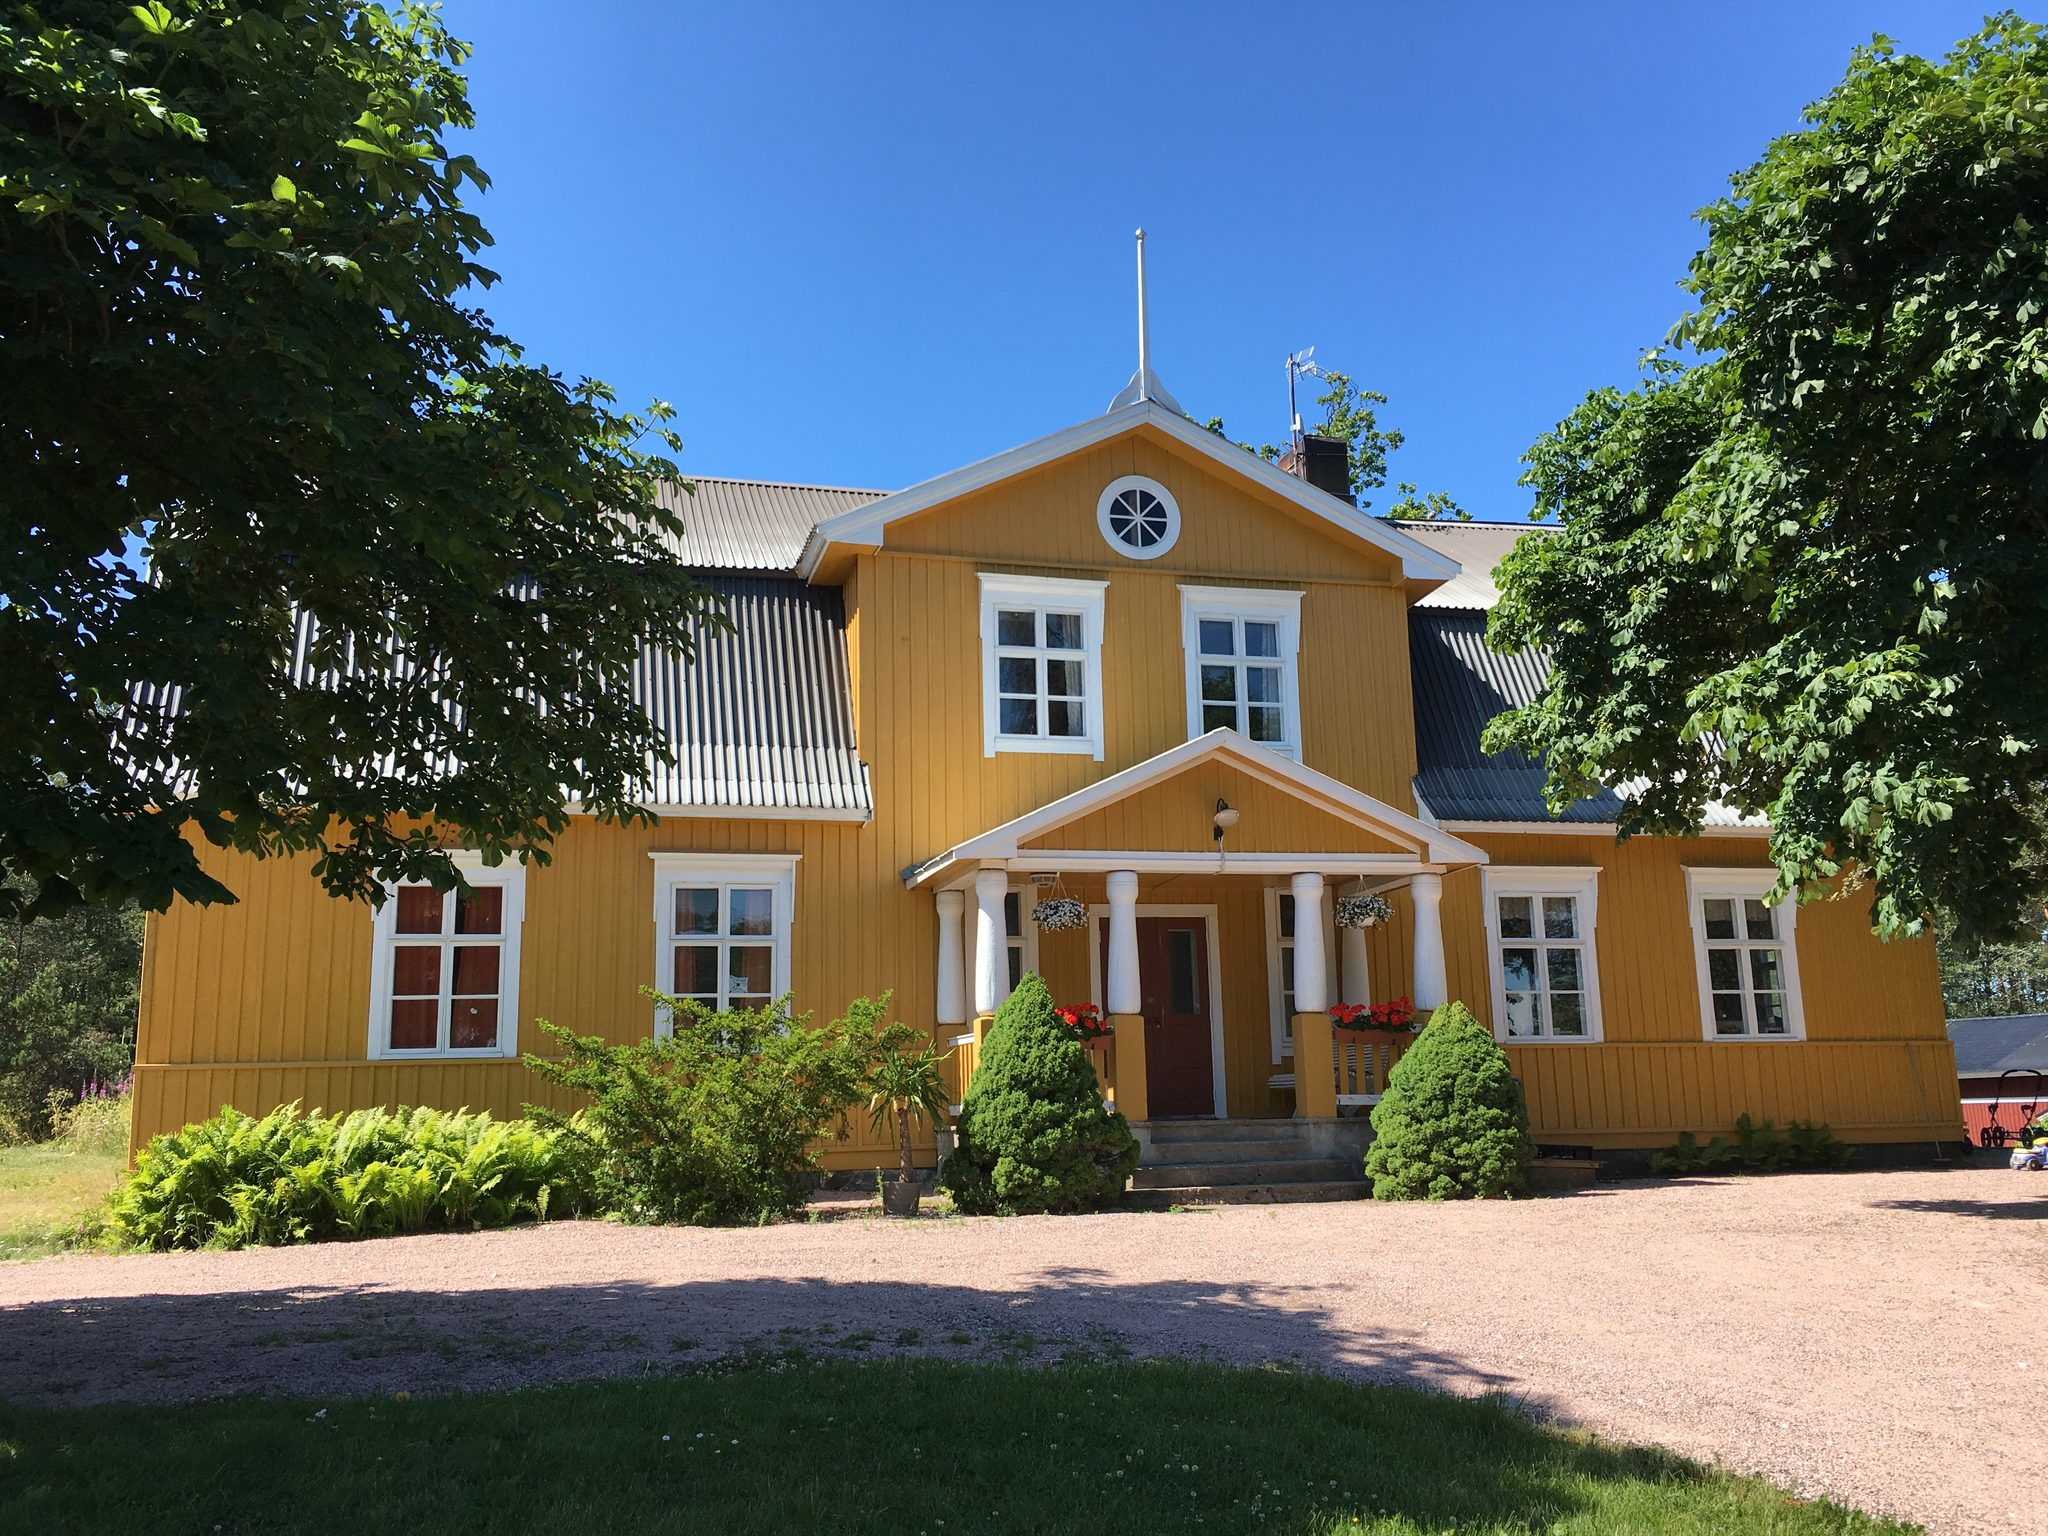 Vestlax Mellangård